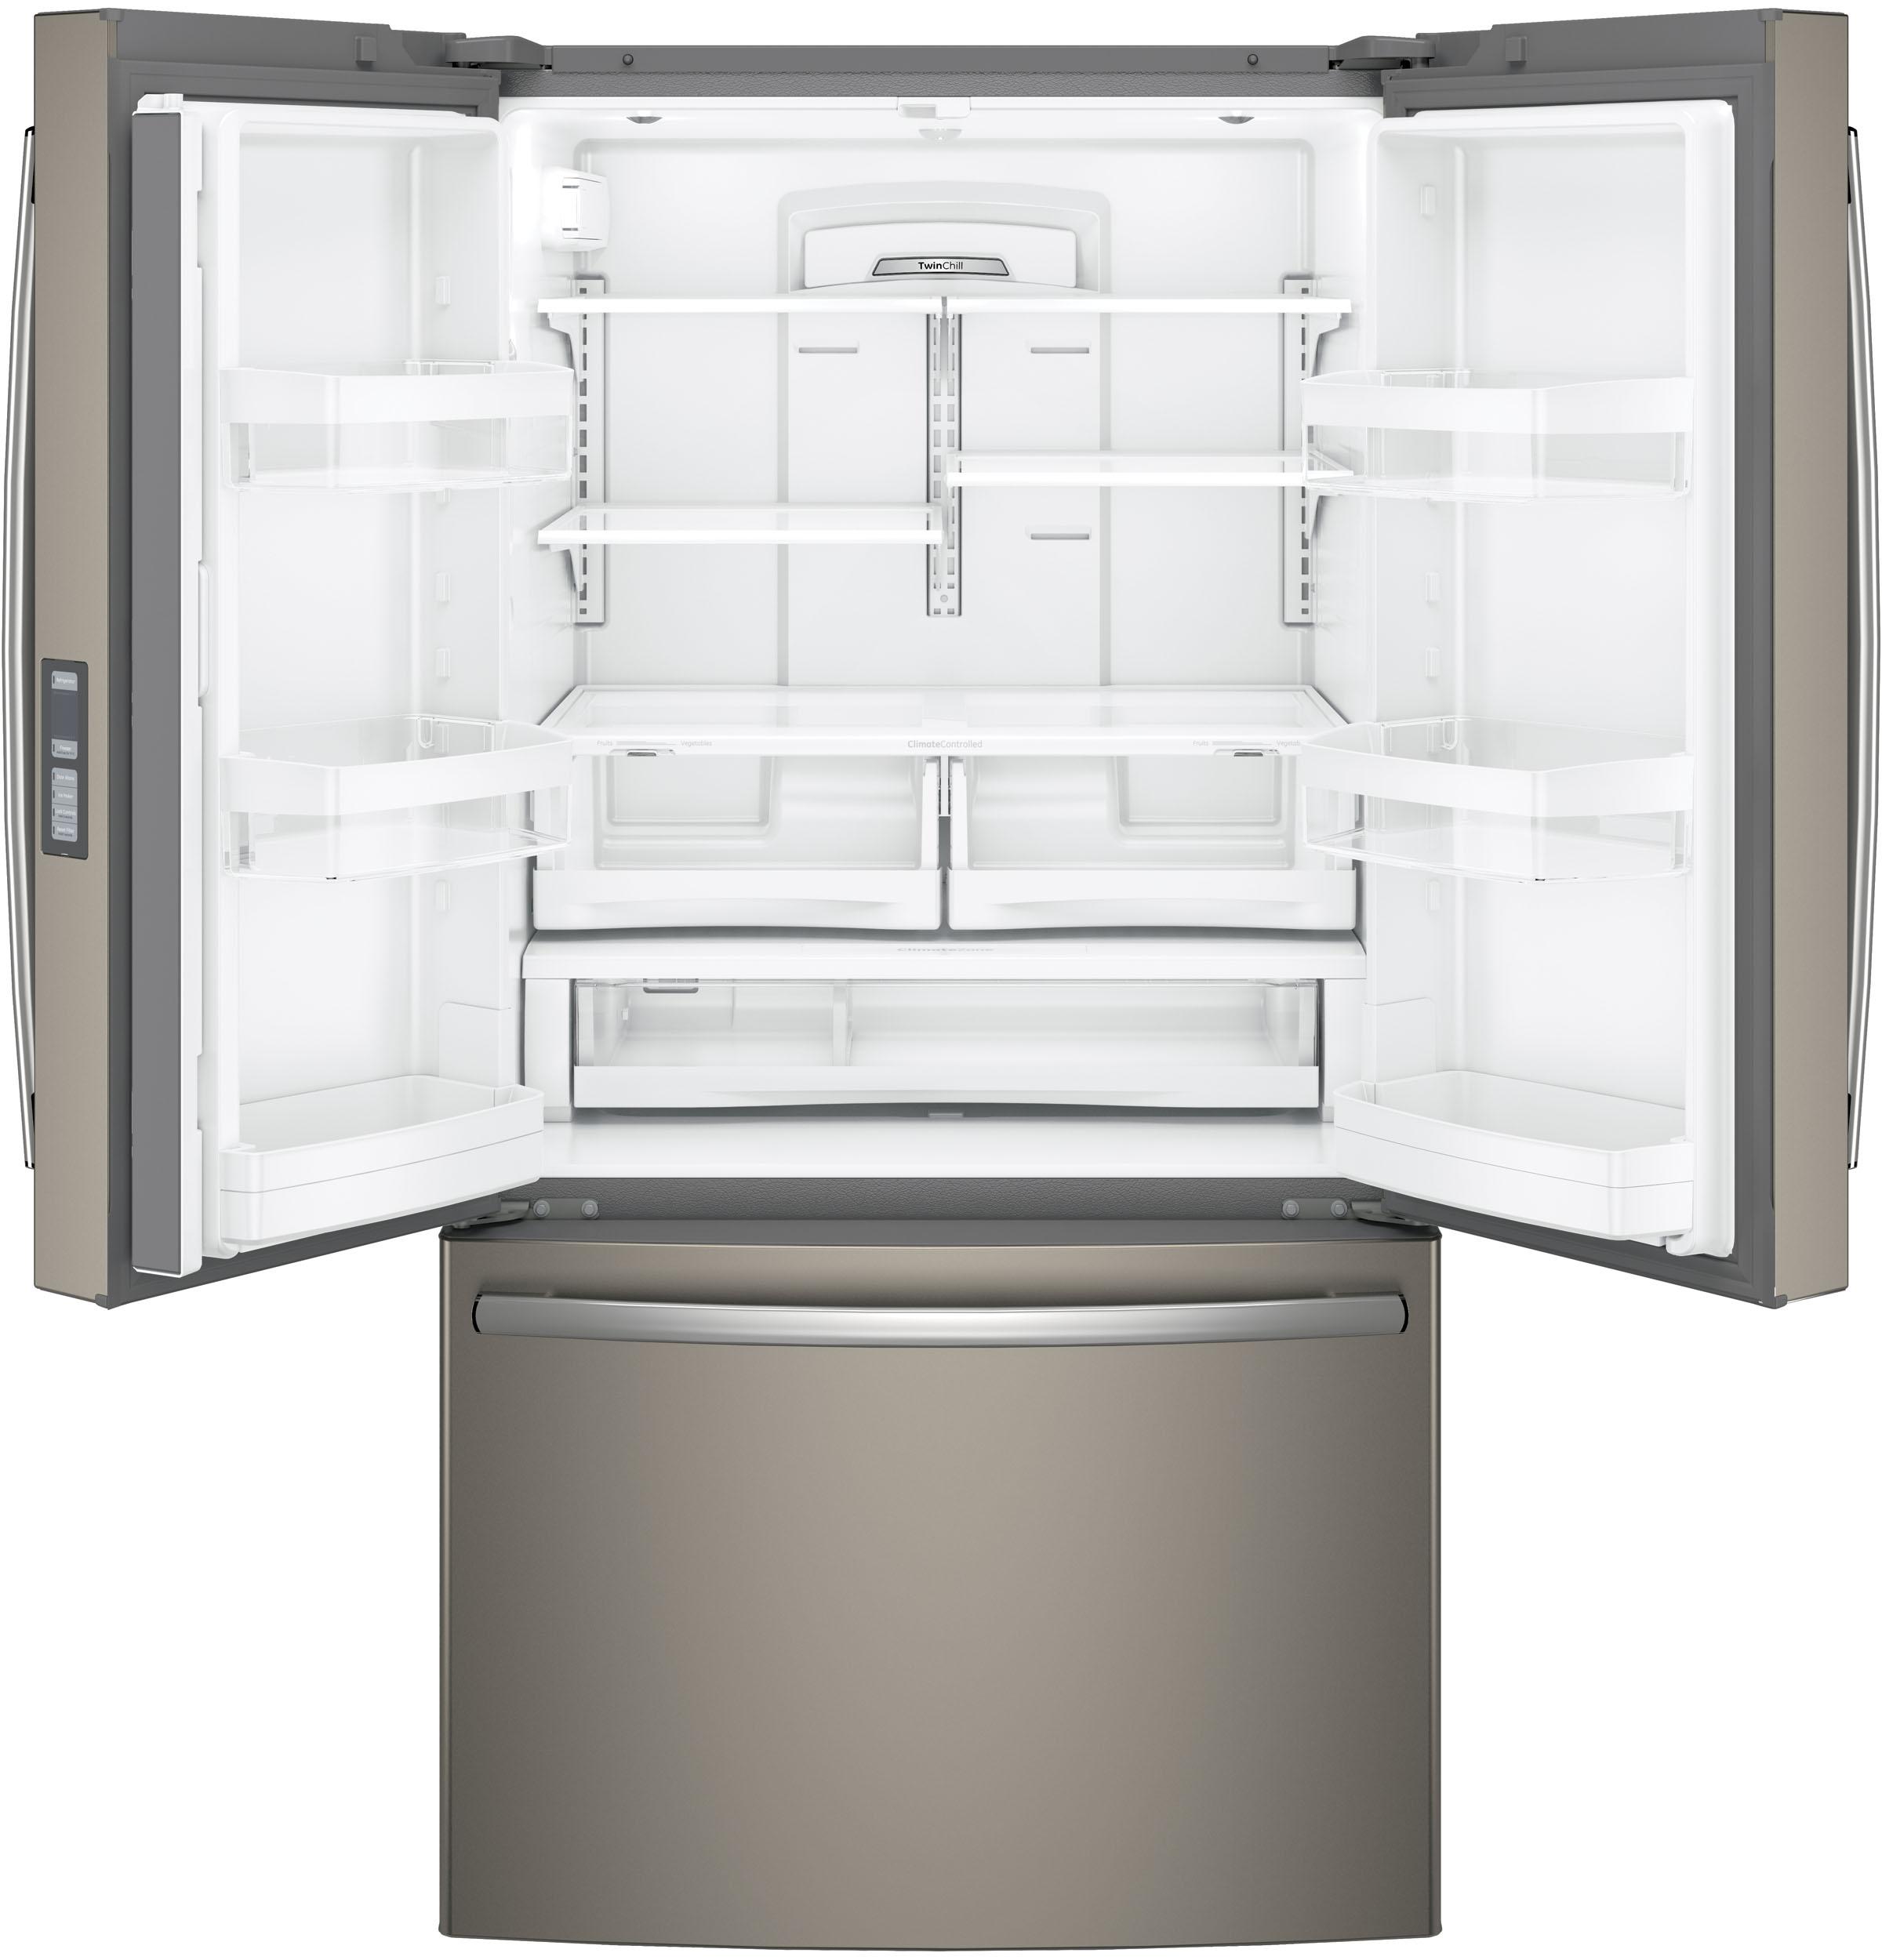 GE Appliances GNE29GMKES 28.7 cu. ft. French Door Refrigerator - Slate